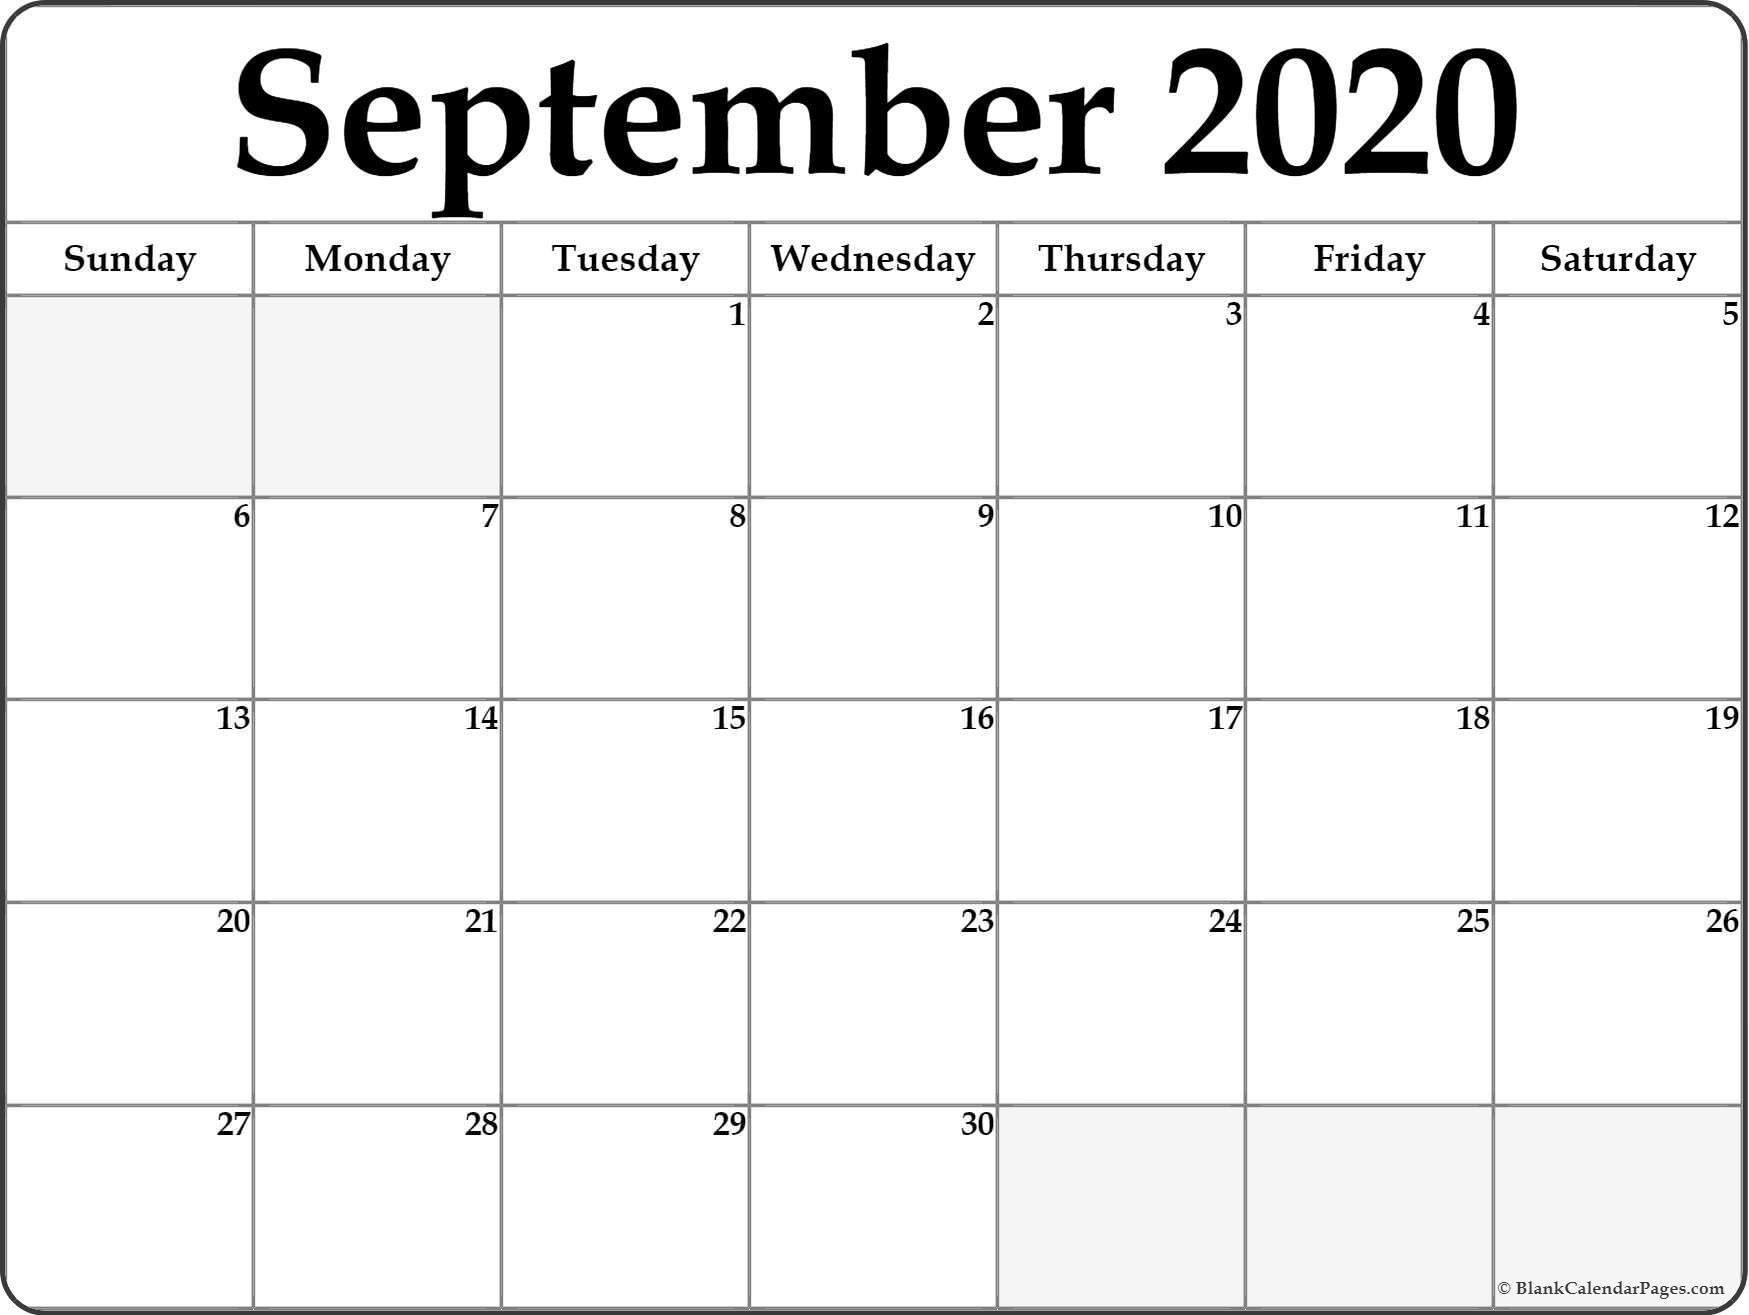 September 2020 Calendar | Free Printable Monthly Calendars-Monday Through Friday September Calendar Template 2020